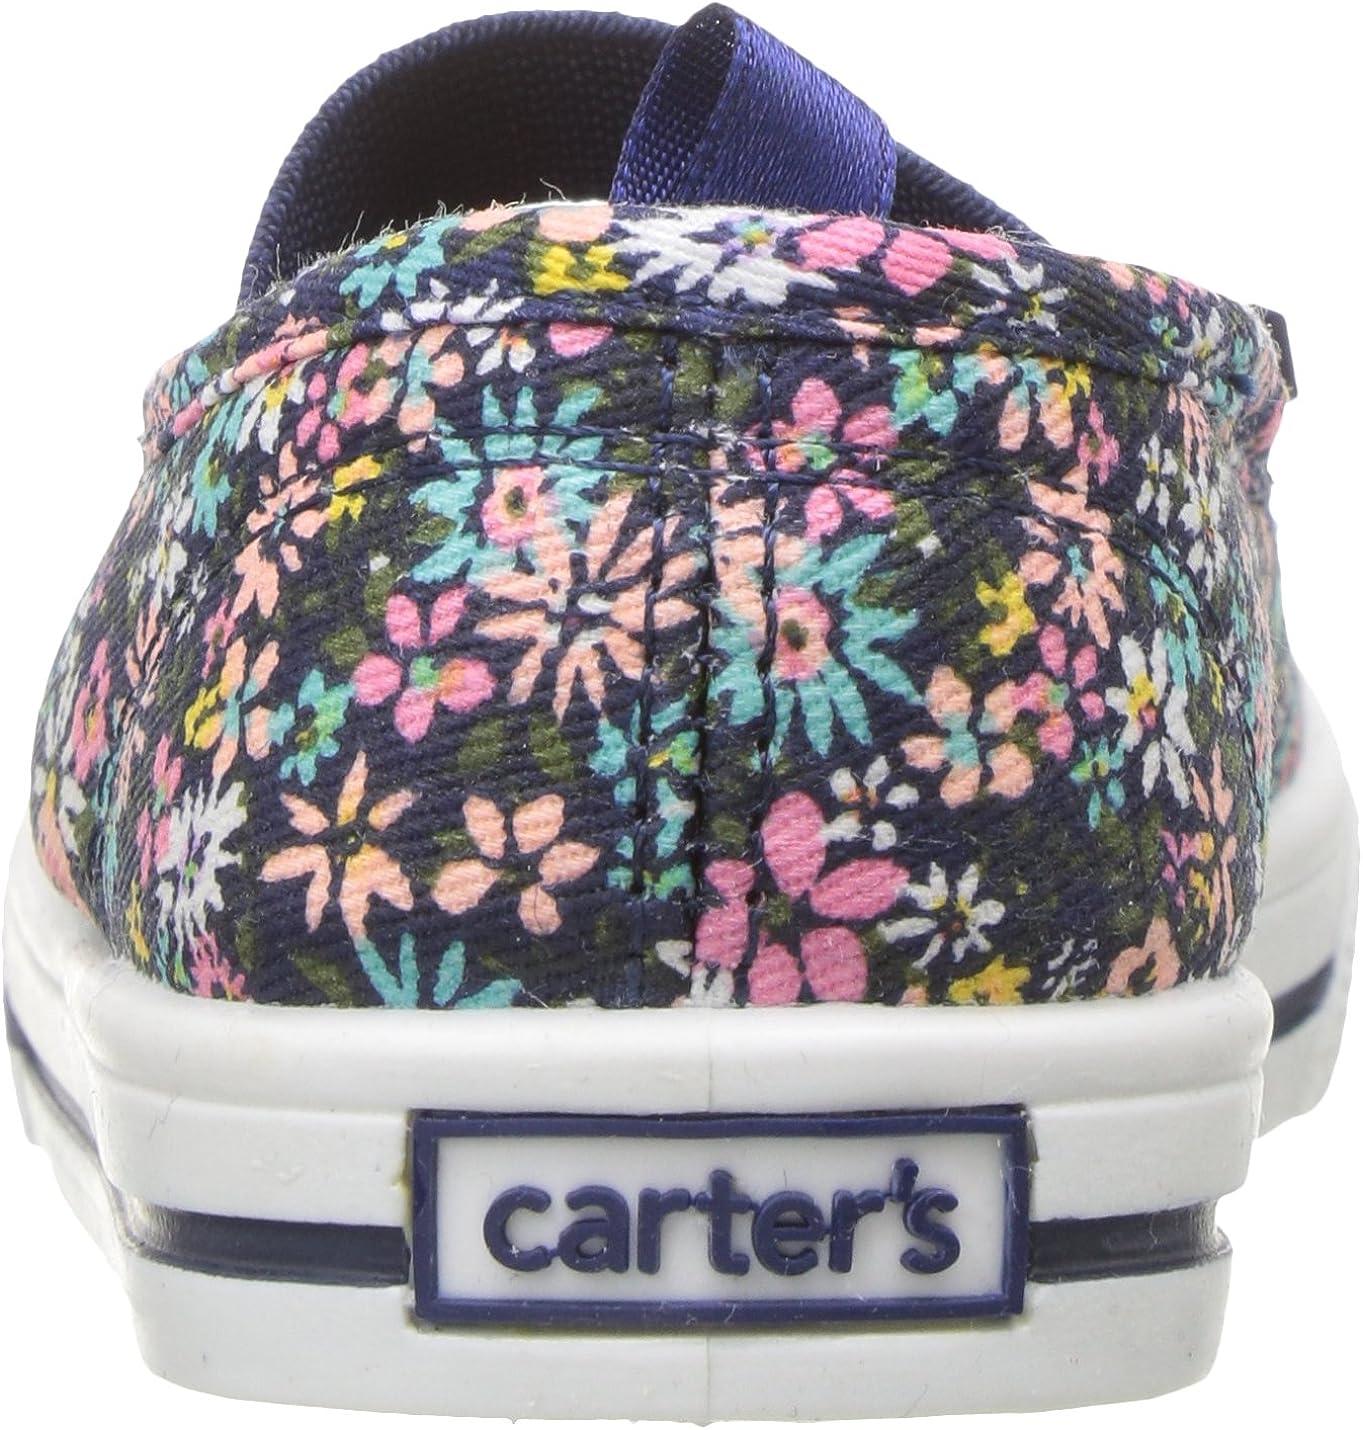 Carters Kids Girls Briana Floral Print Casual Maryjane Mary Jane Flat